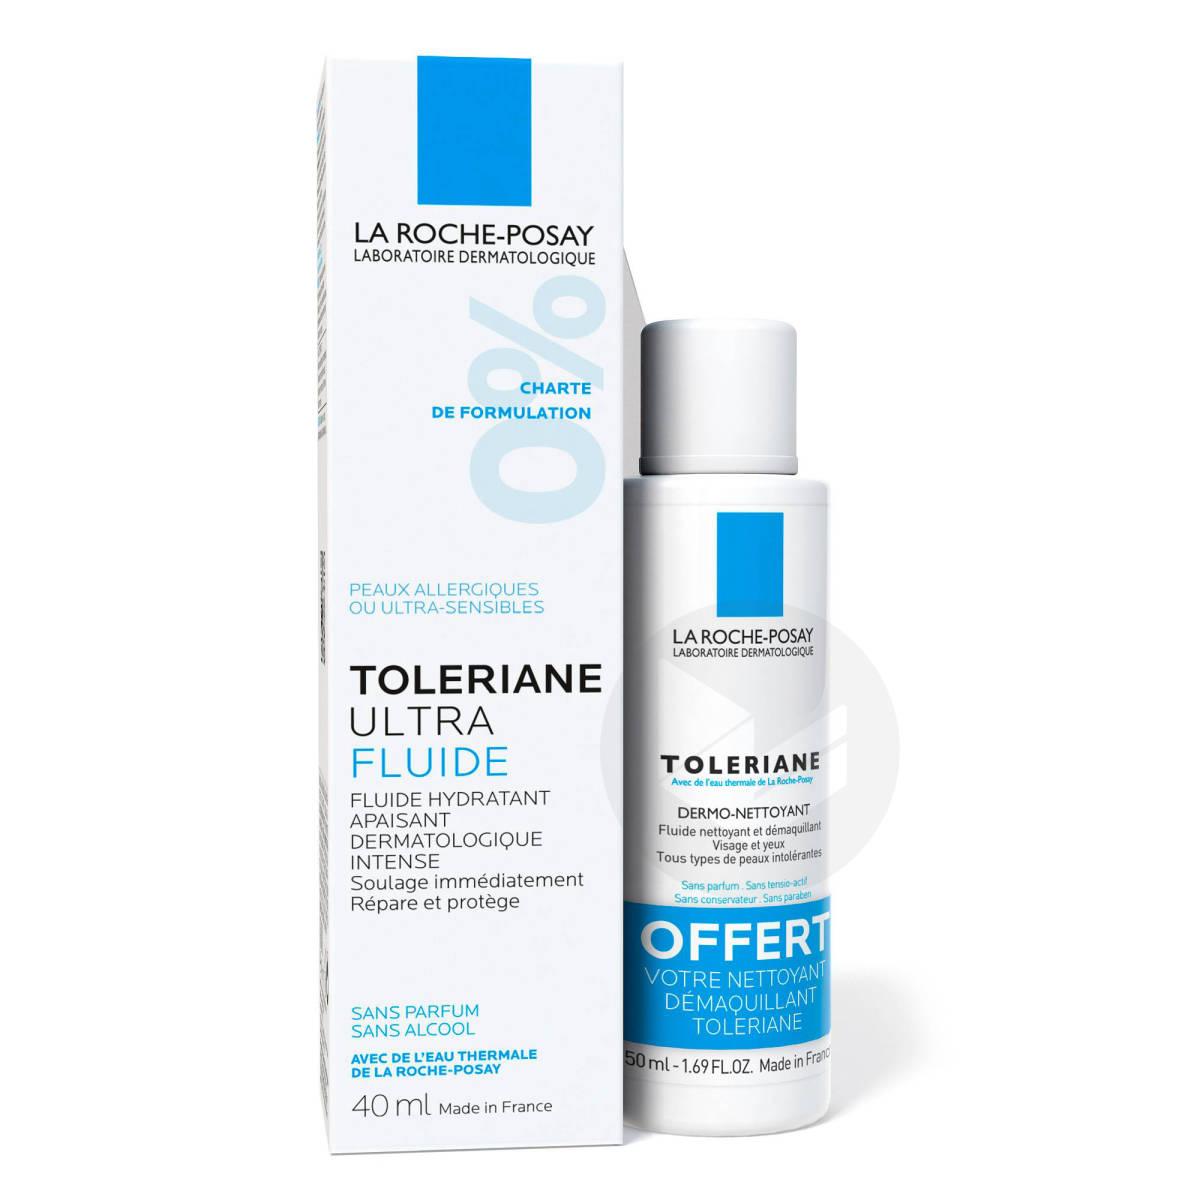 Toleriane Ultra Fluide hydratant apaisant intense 40ml  + Démaquillant offert